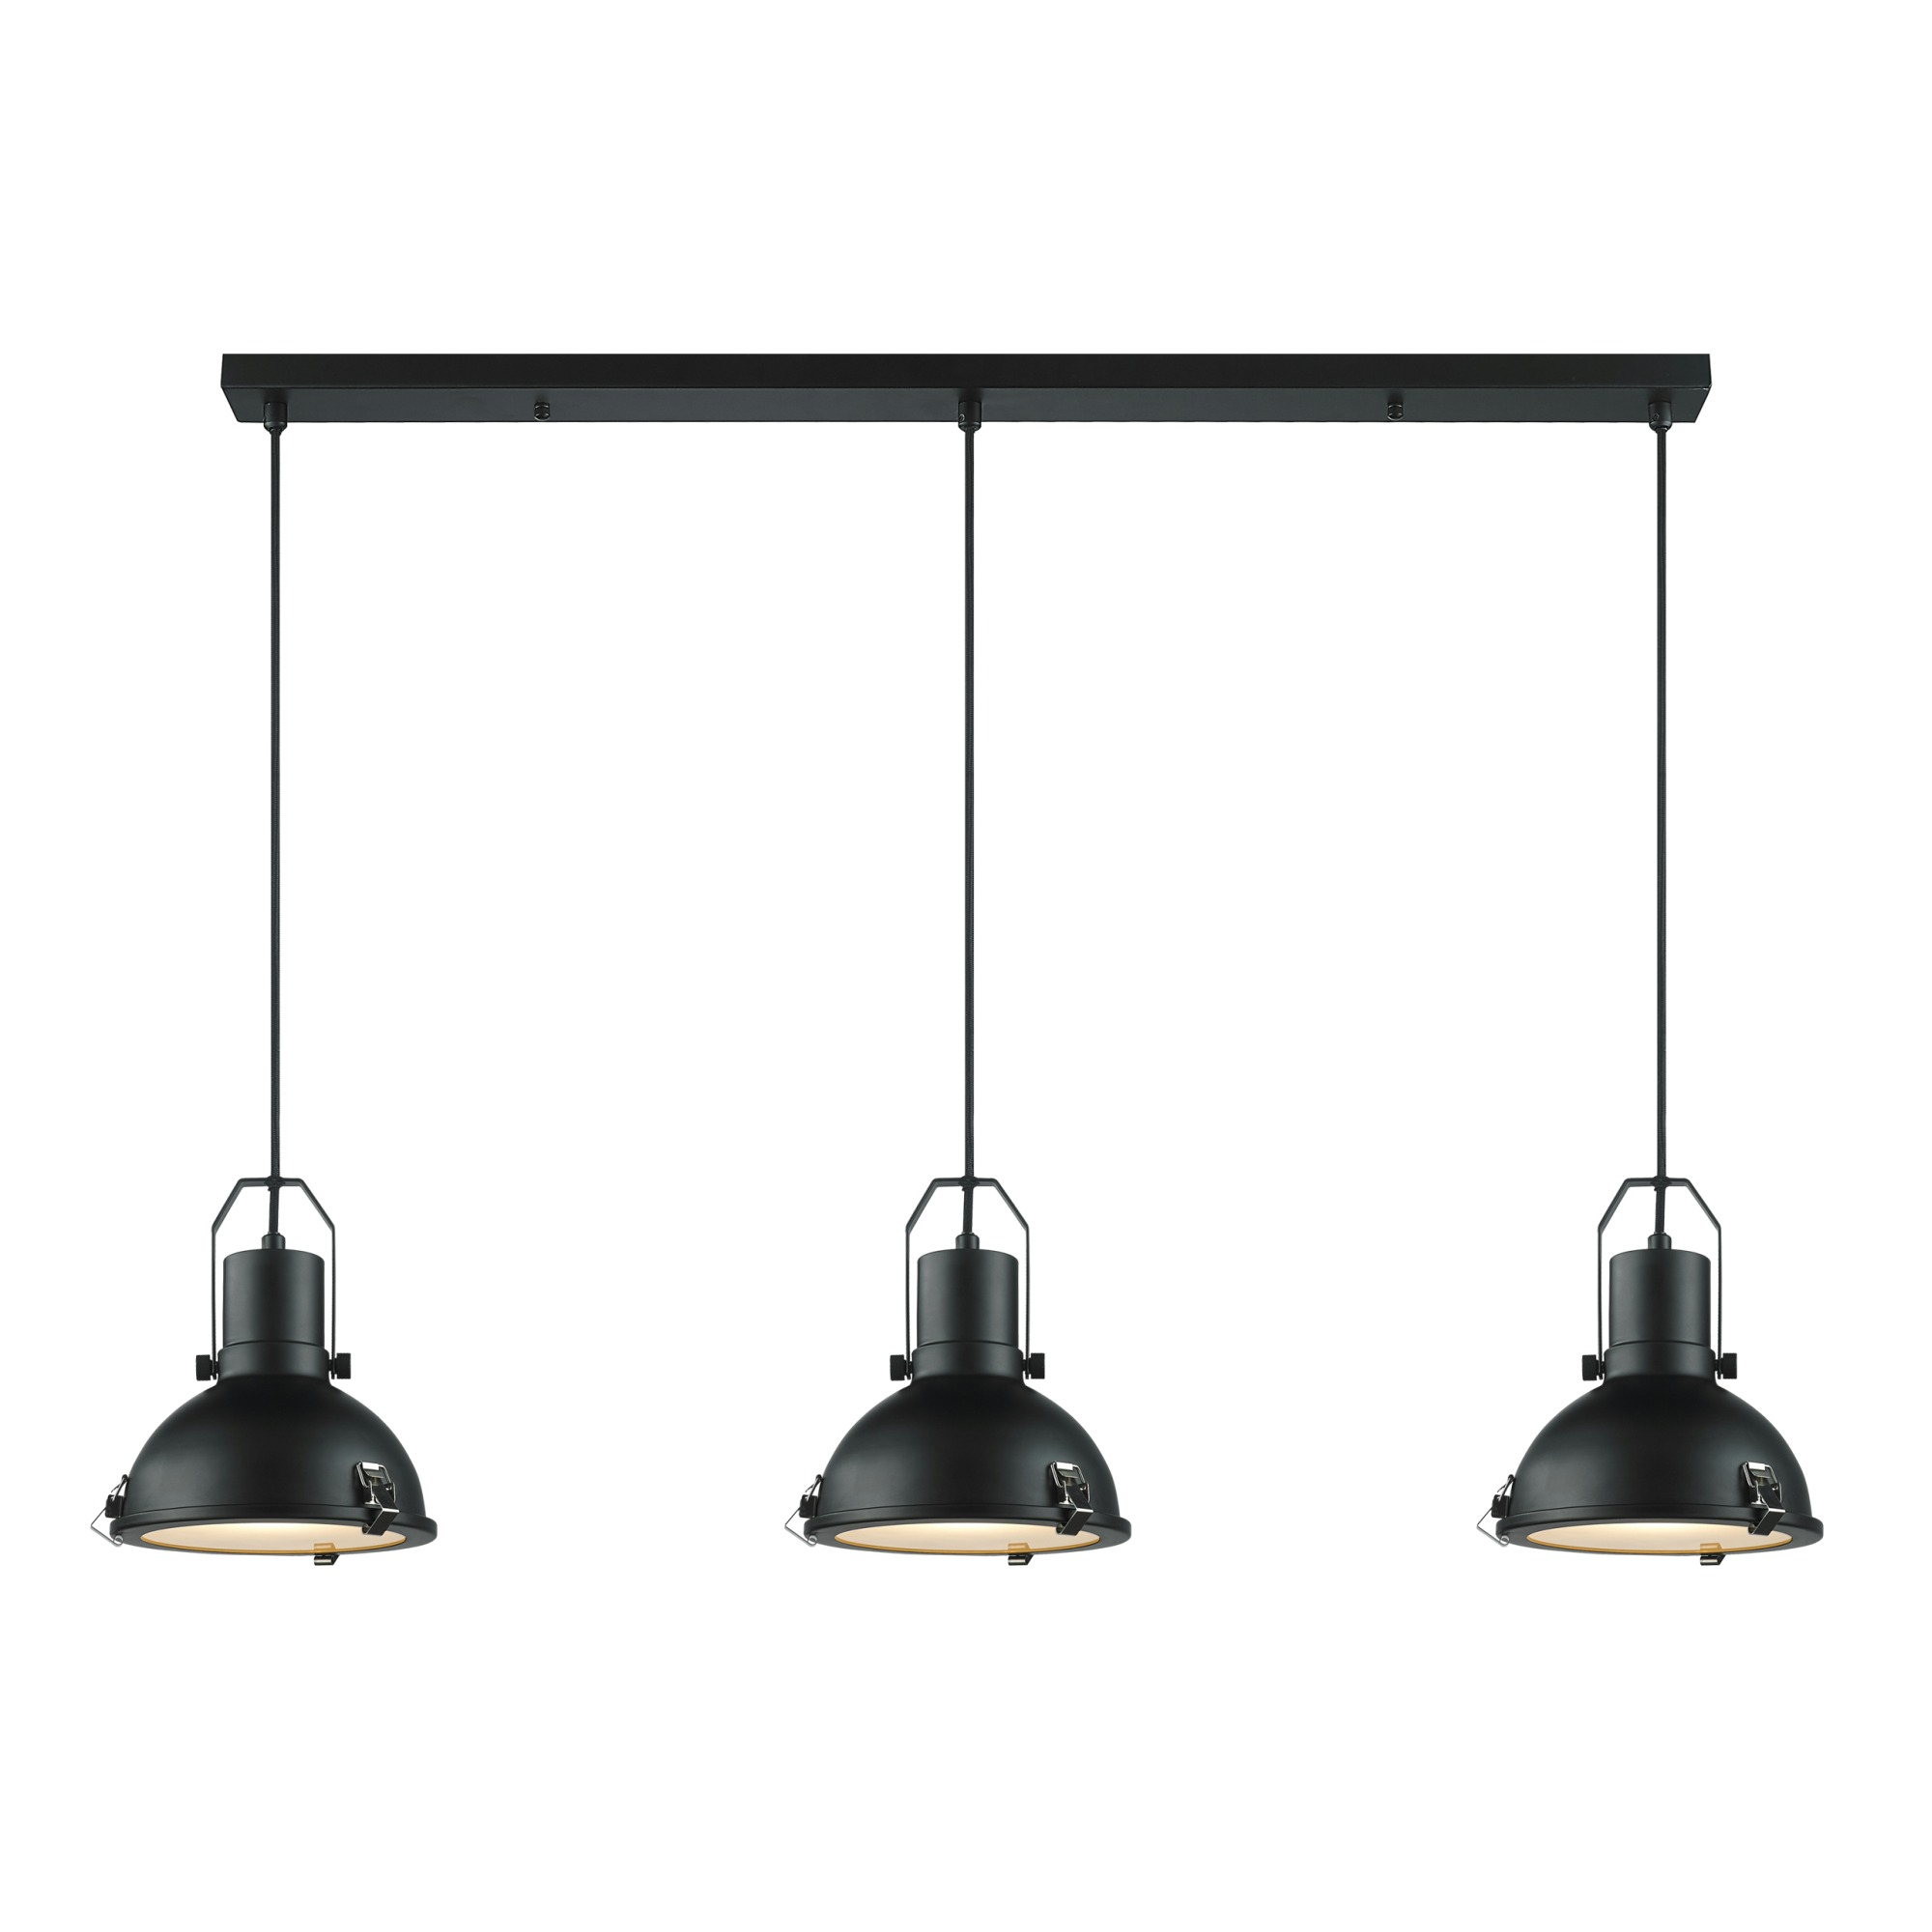 Karwei hanglamp magnus zwart hanglampen verlichting for Kleine industriele hanglamp